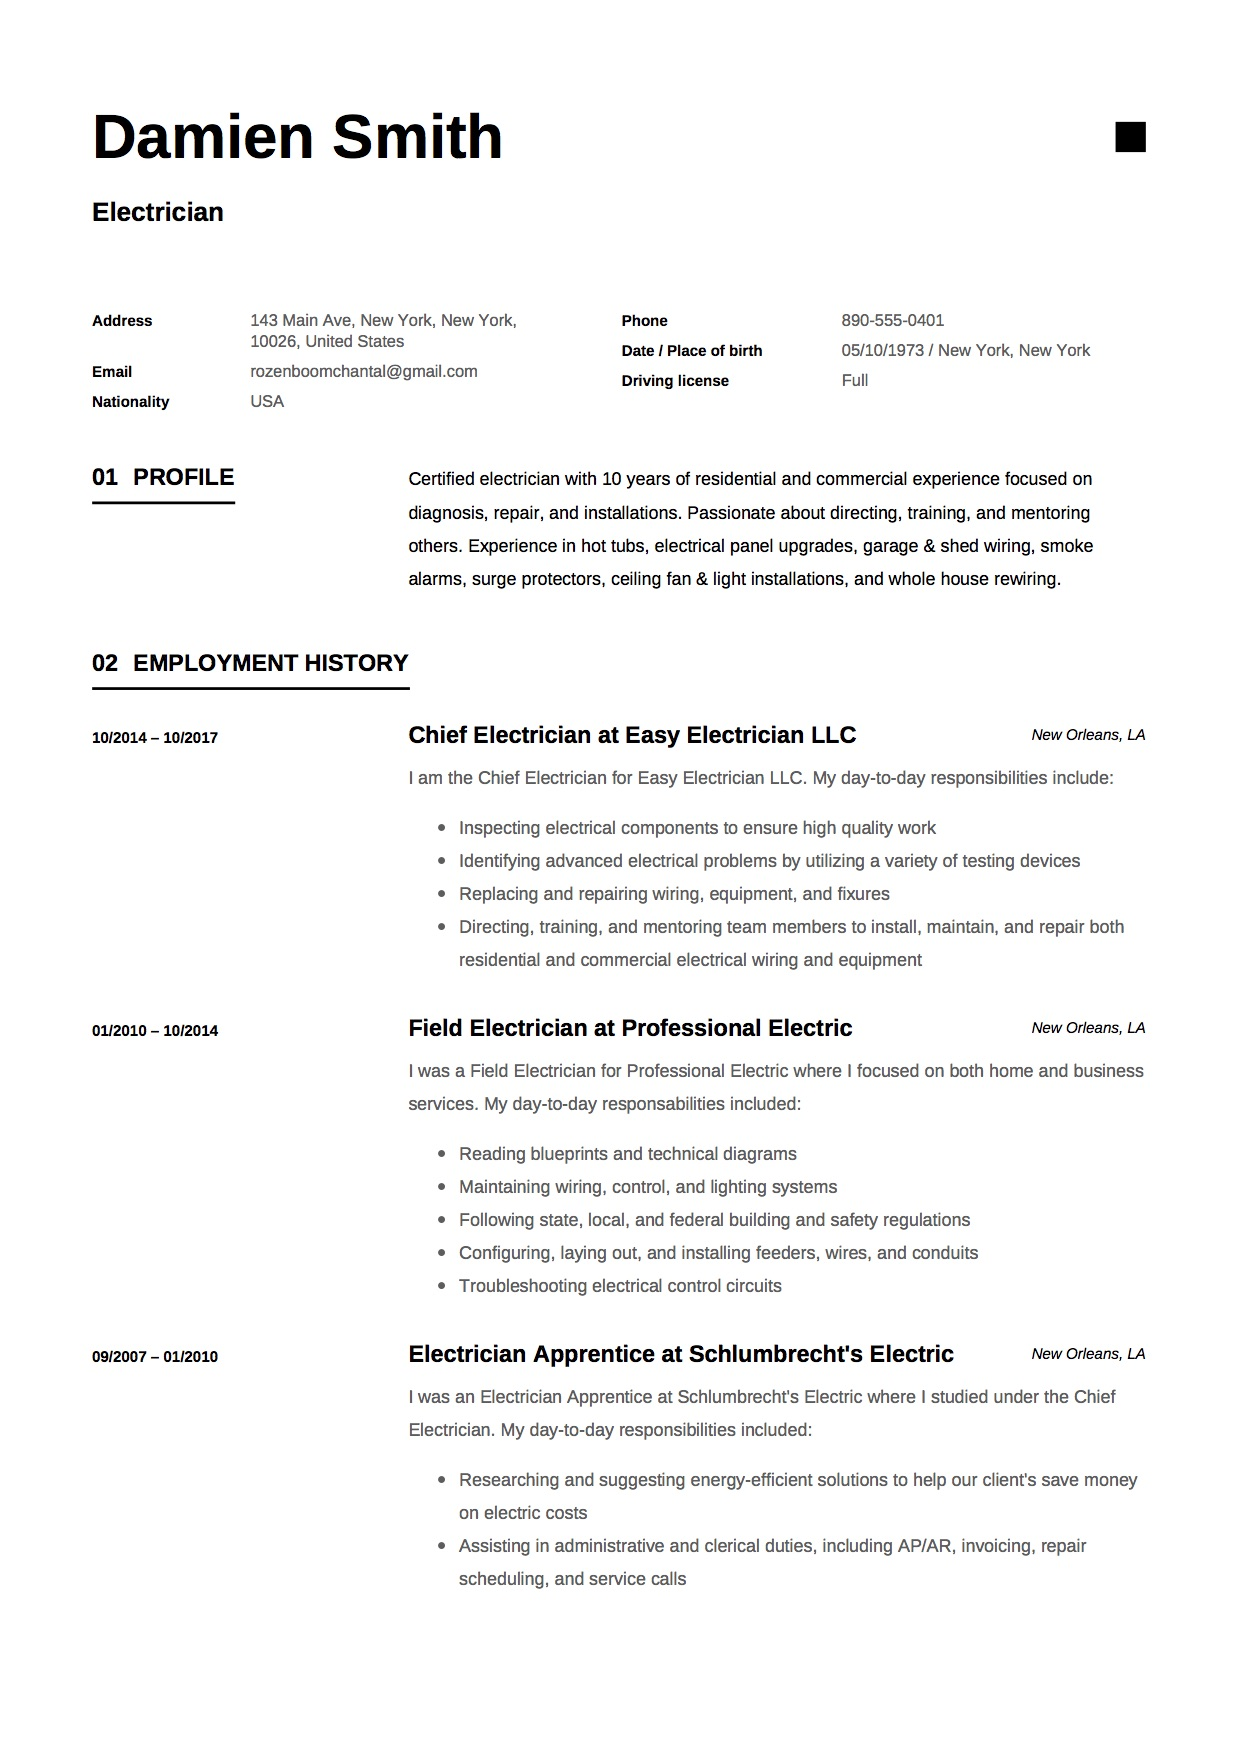 Electrician Resume Template